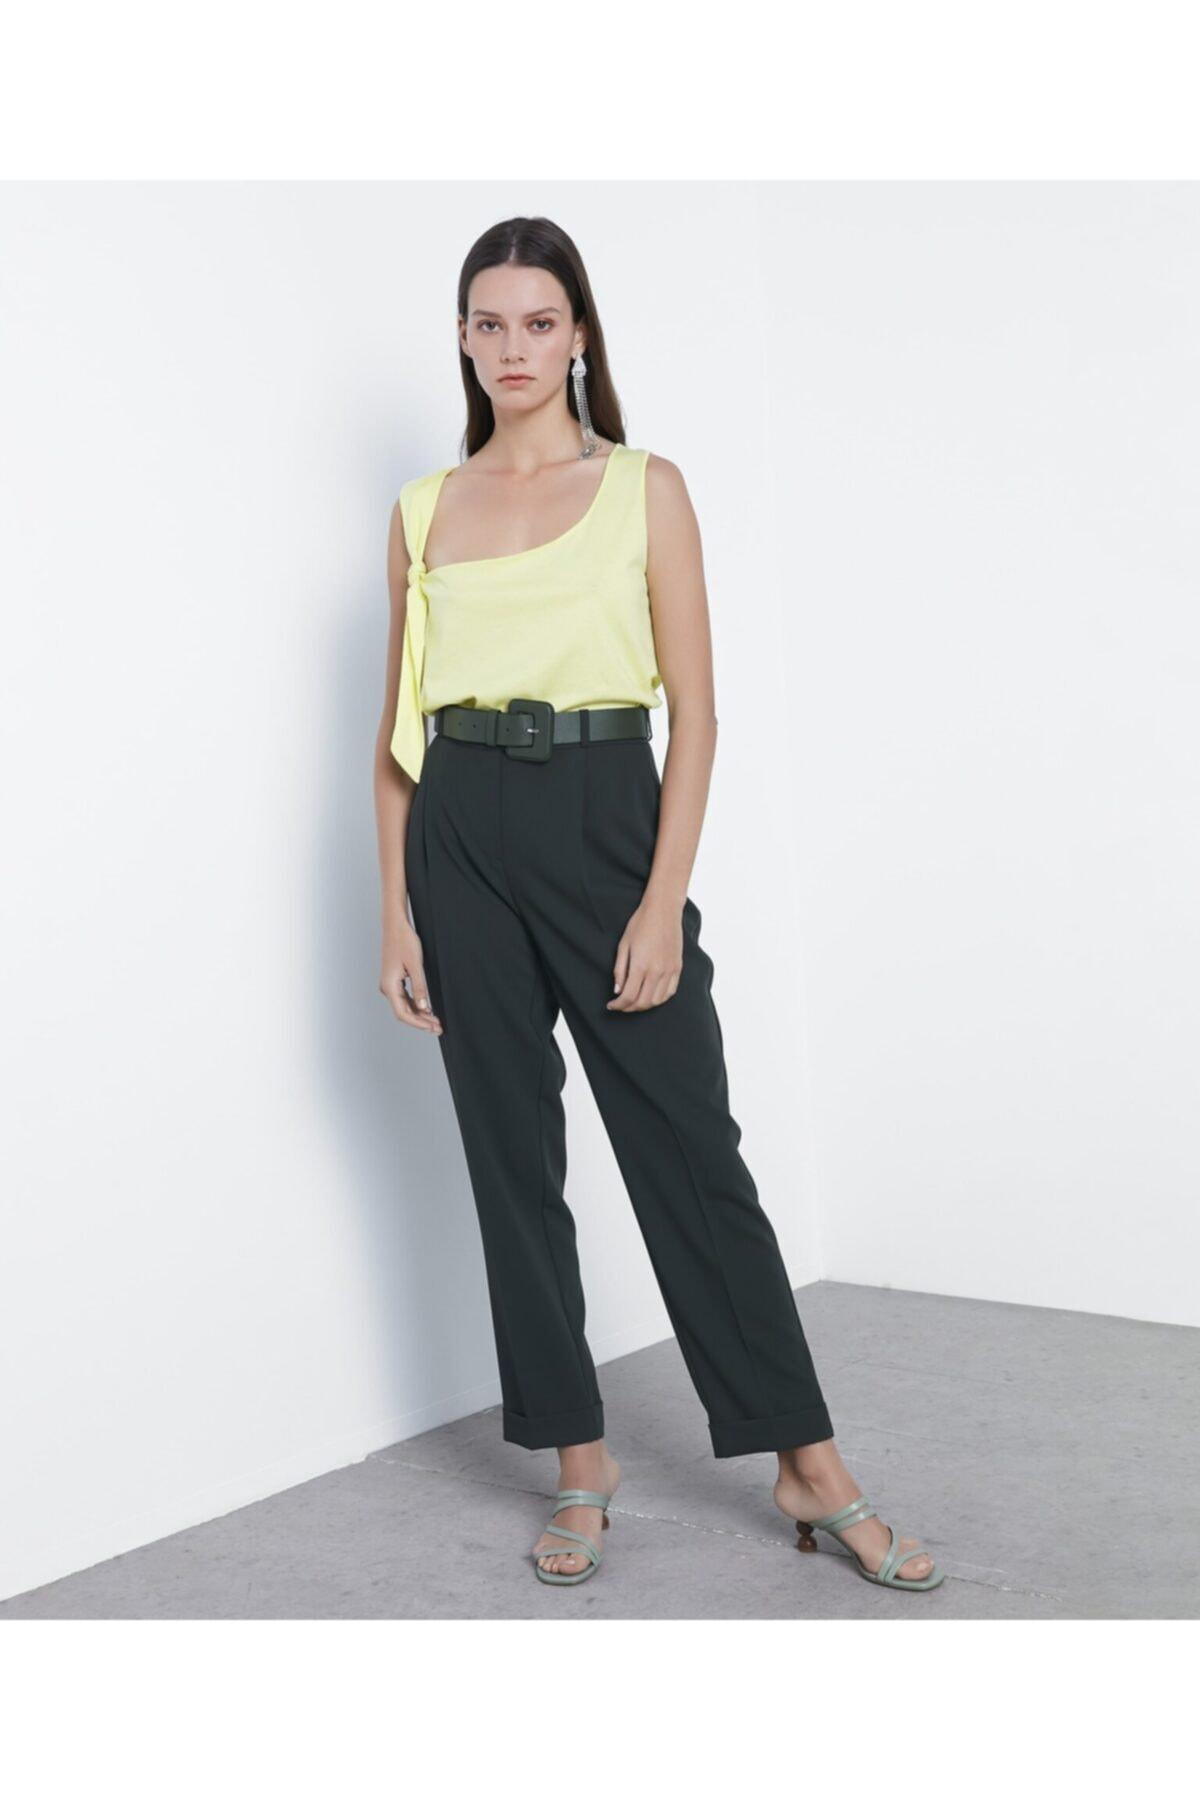 İpekyol Kadın Açık Yeşil Askı Detaylı Tshirt 2